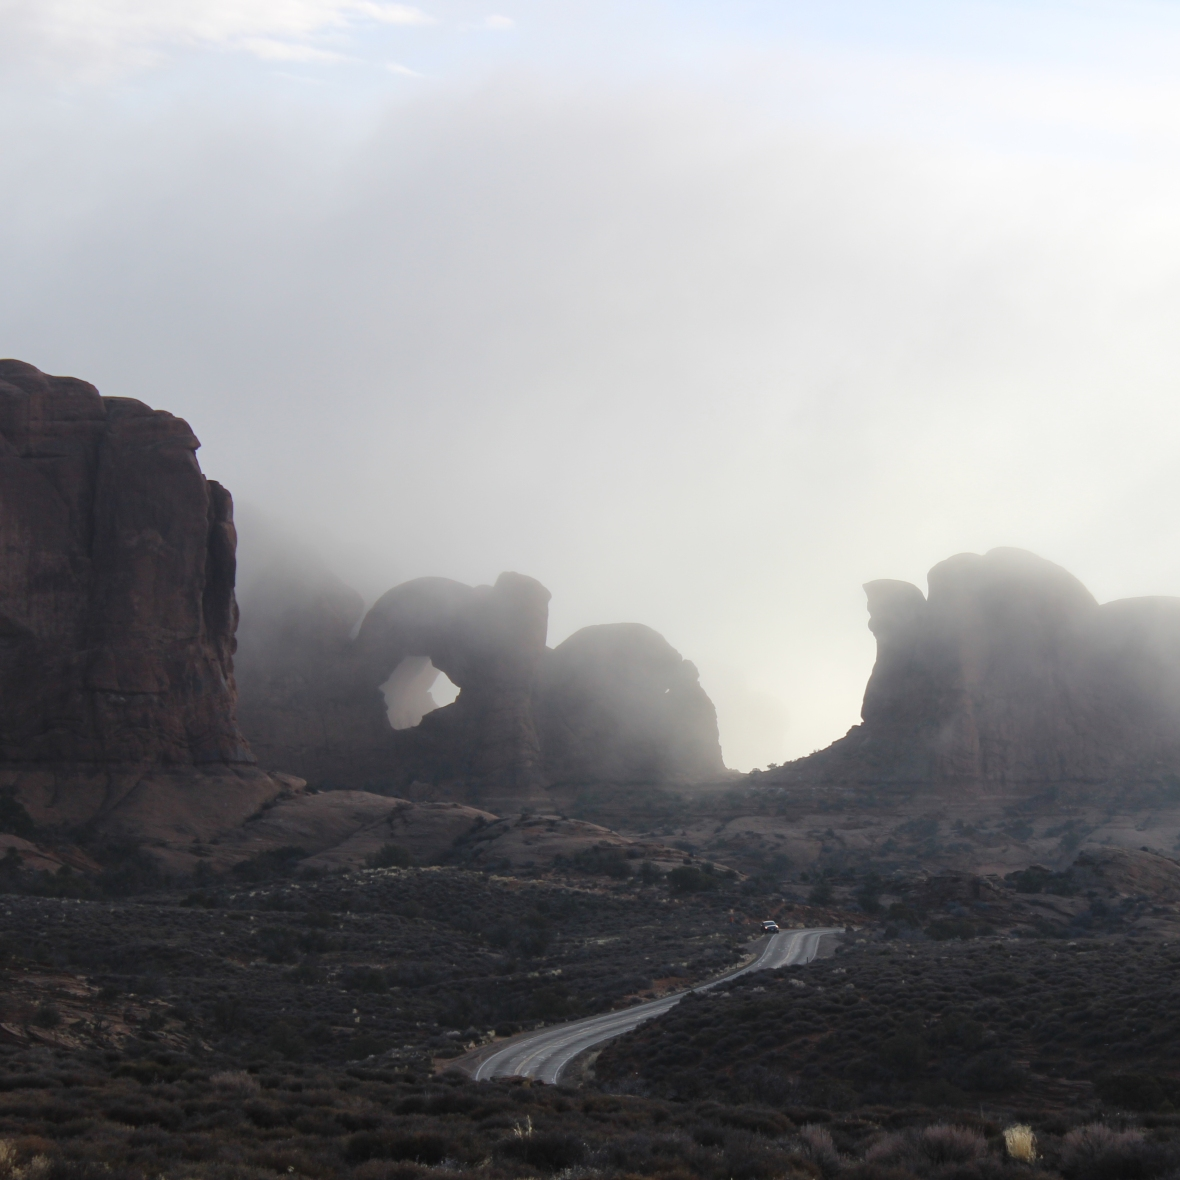 Drive through Arches National Park